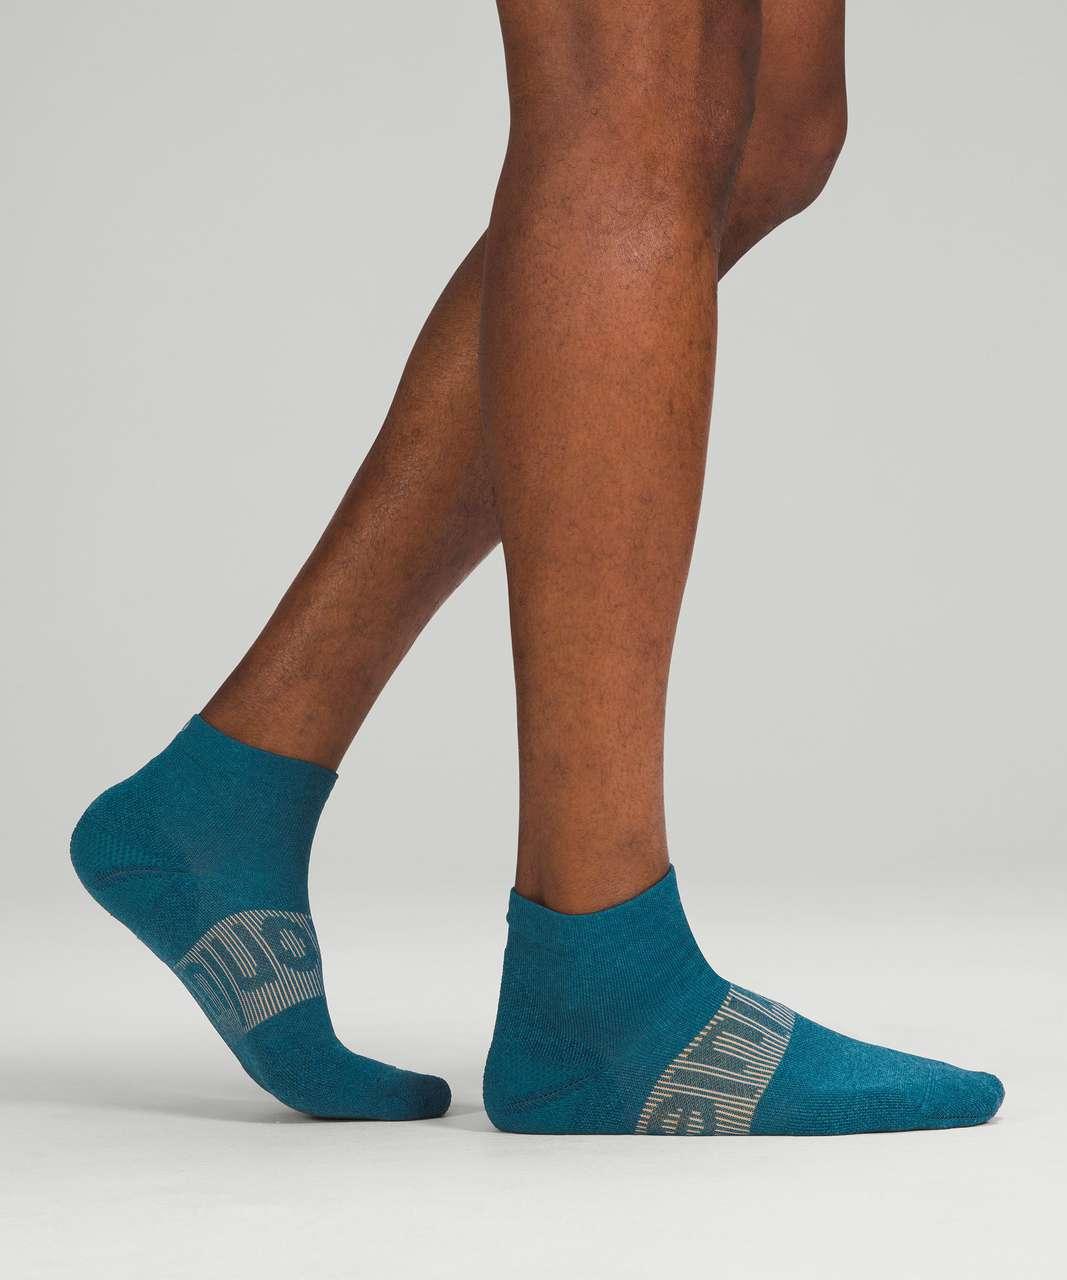 Lululemon Power Stride Ankle Sock - Capture Blue (First Release)